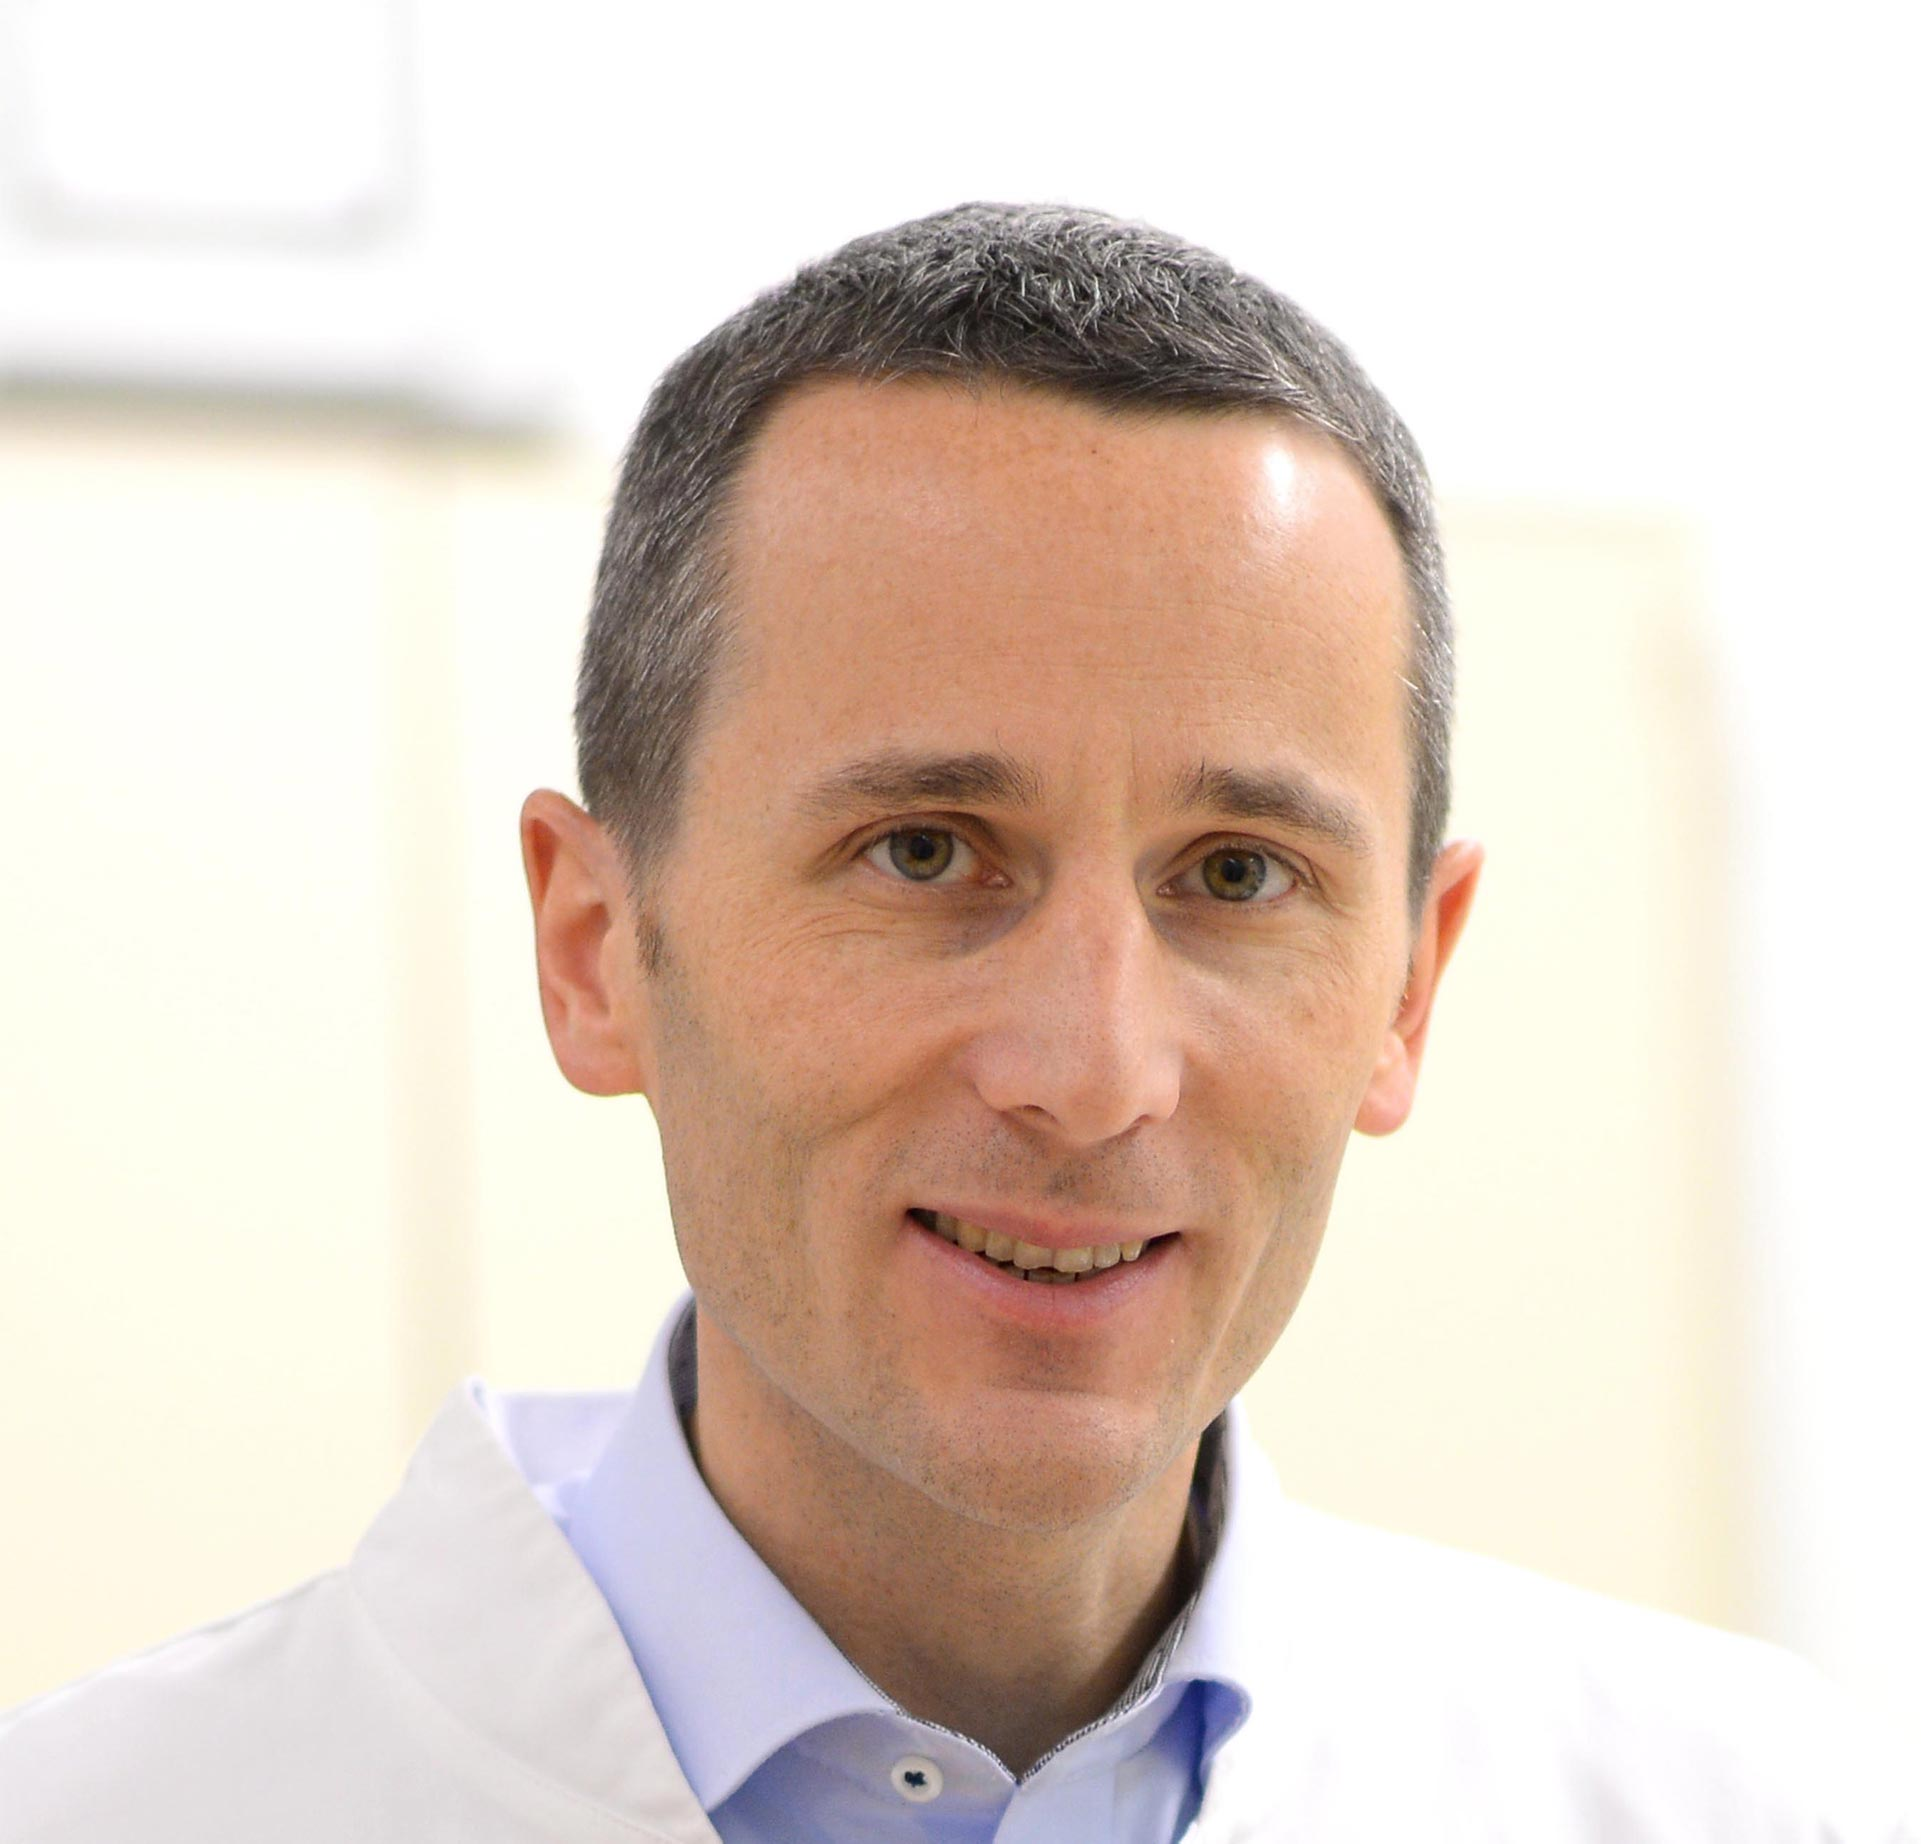 Univ.-Prof. Dr. Alexander Mellmann